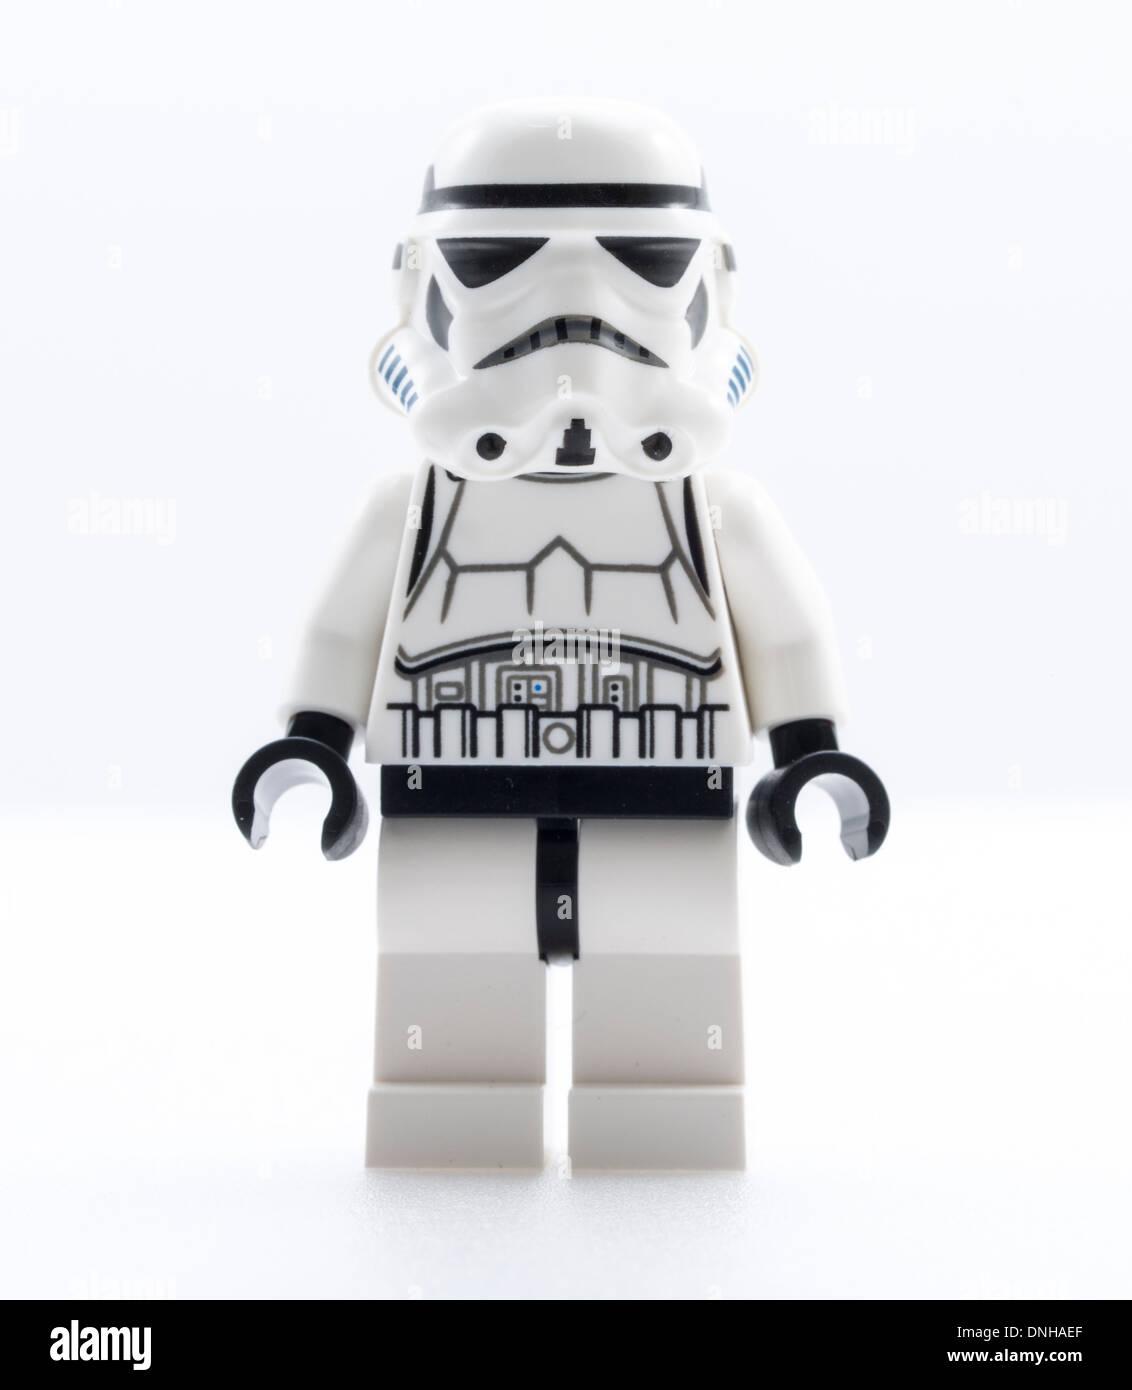 Lego Star Wars Stormtrooper Jouets Playmobil - 5116 - Moto Photo Stock